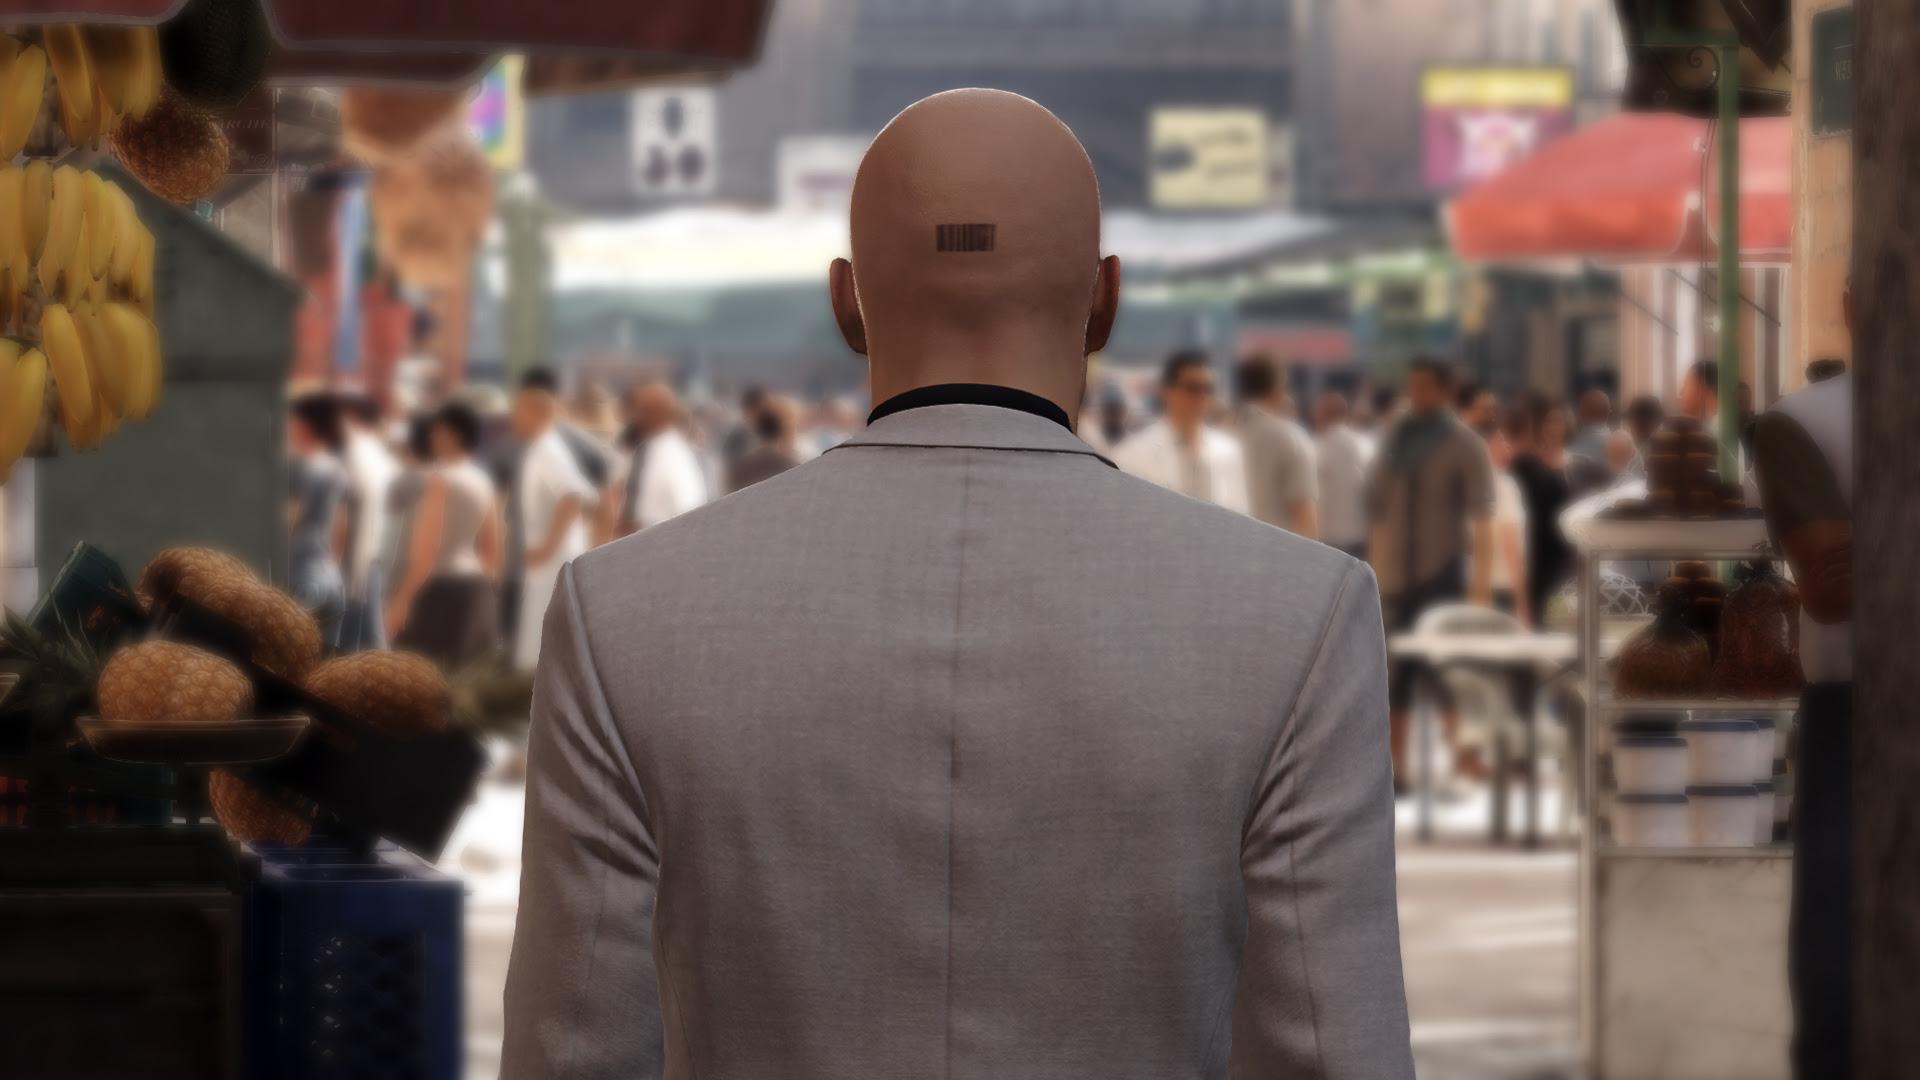 Hitman's final elusive target is named Mr. Giggles screenshot